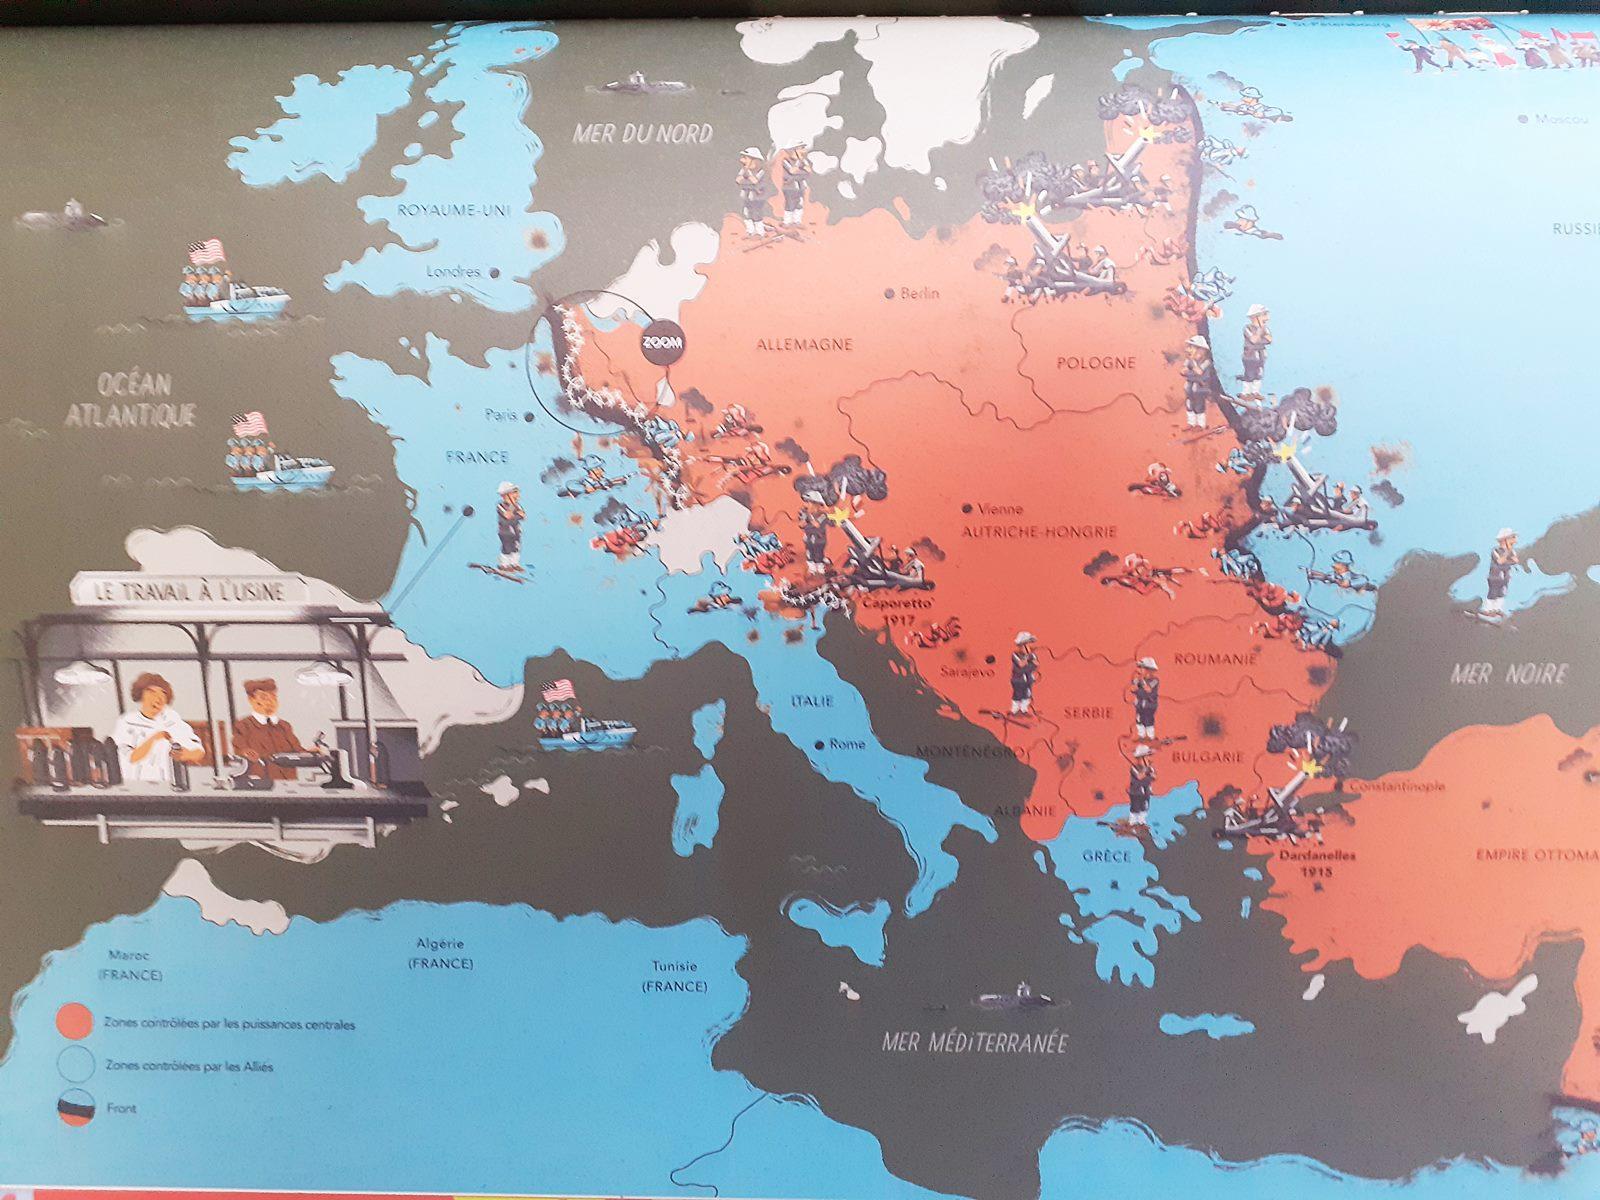 Atlas histoire france20210825 142843